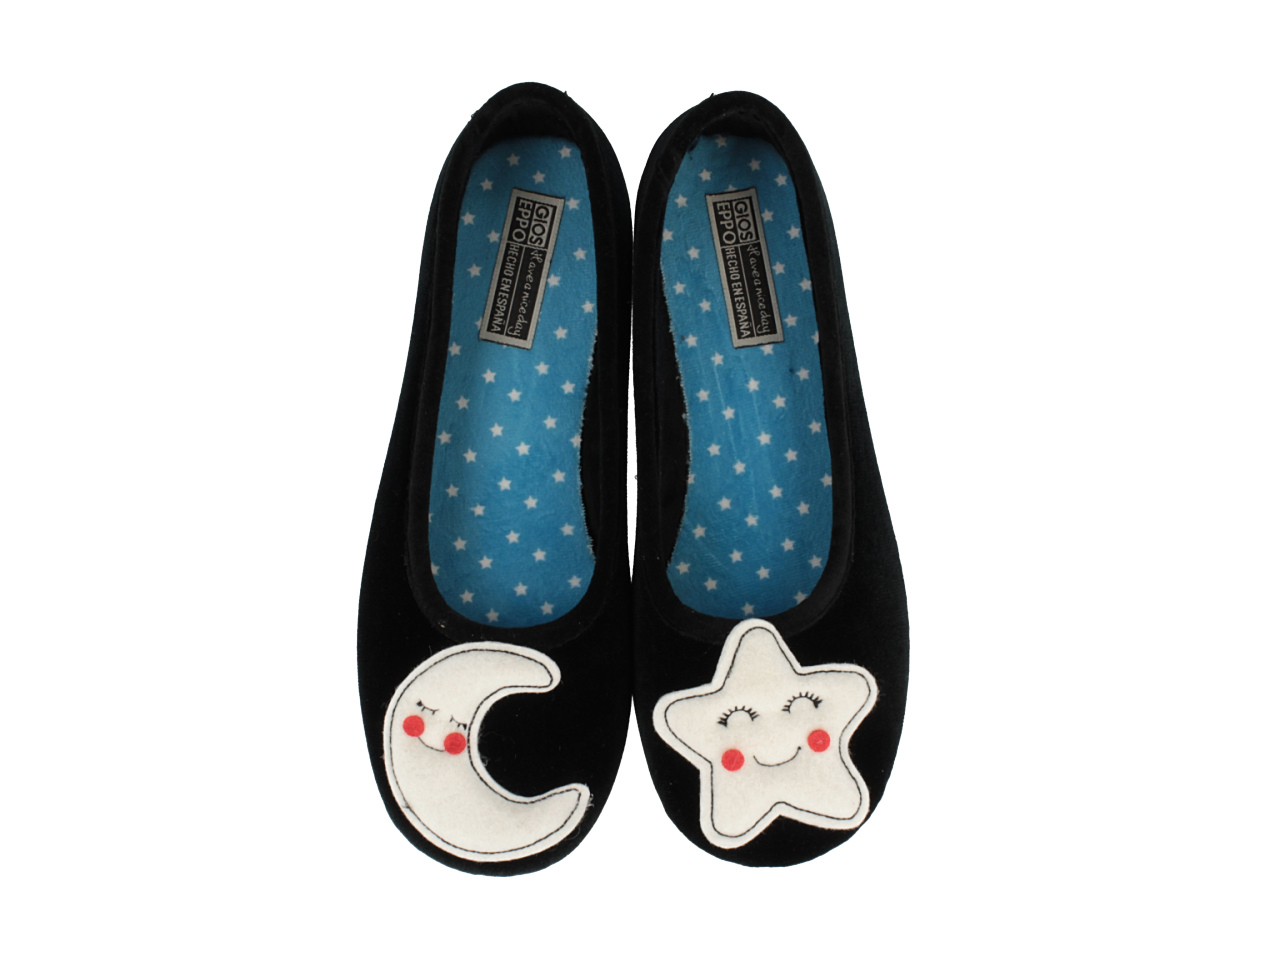 Pantofole calde per sentirsi fashion anche a casa www for Pantofole natalizie